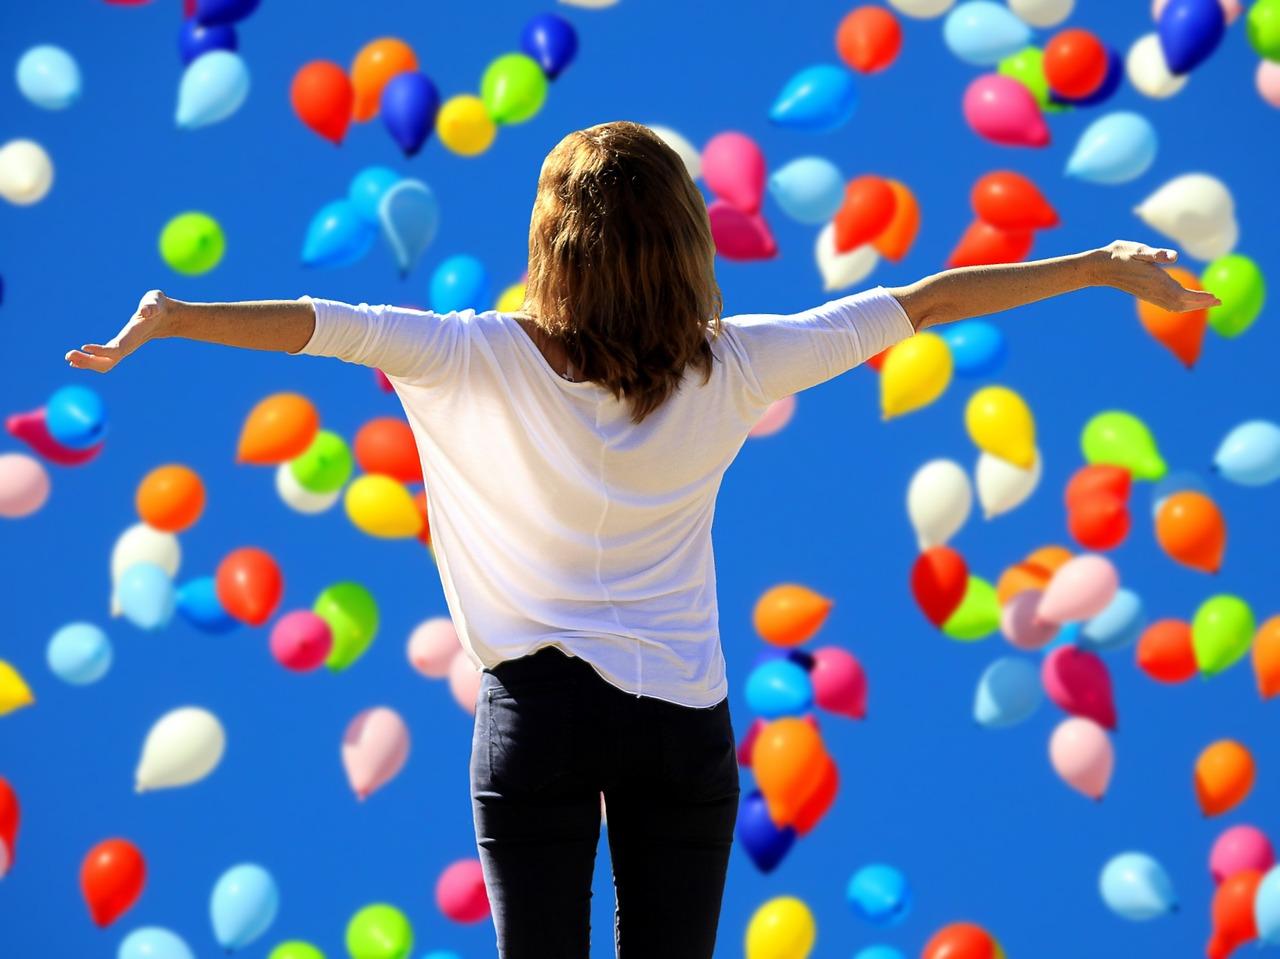 Freude am Leben